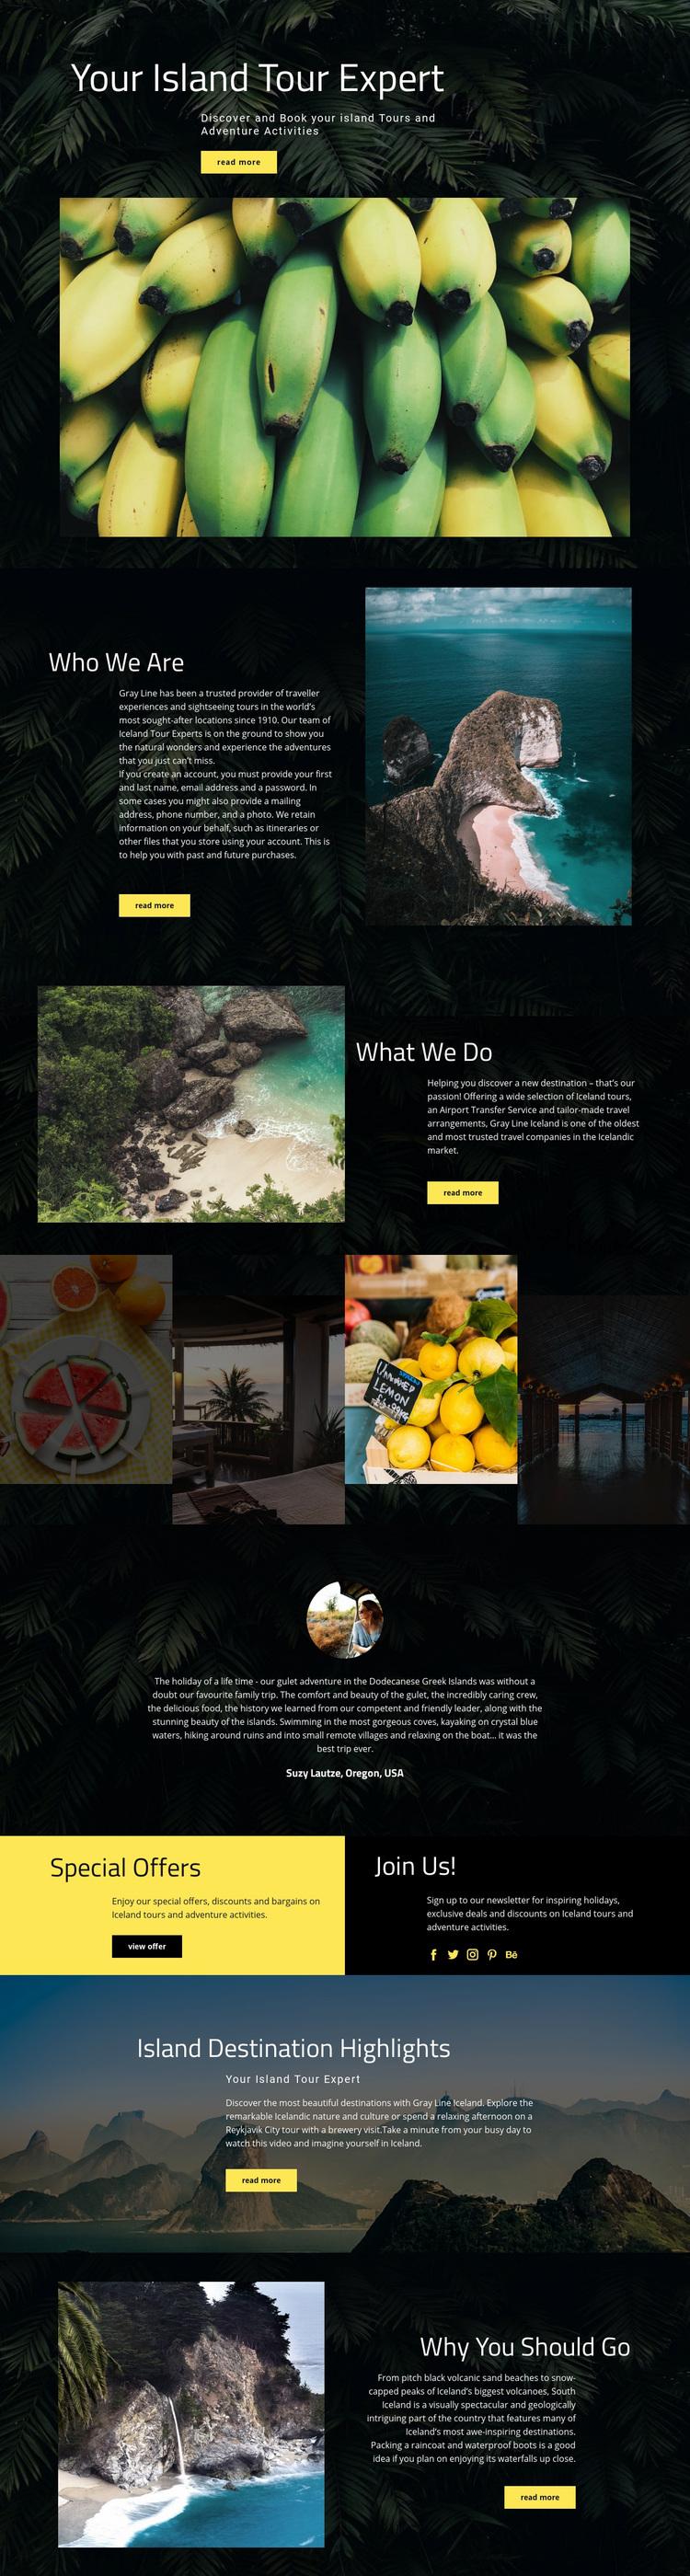 Island Travel Web Page Designer